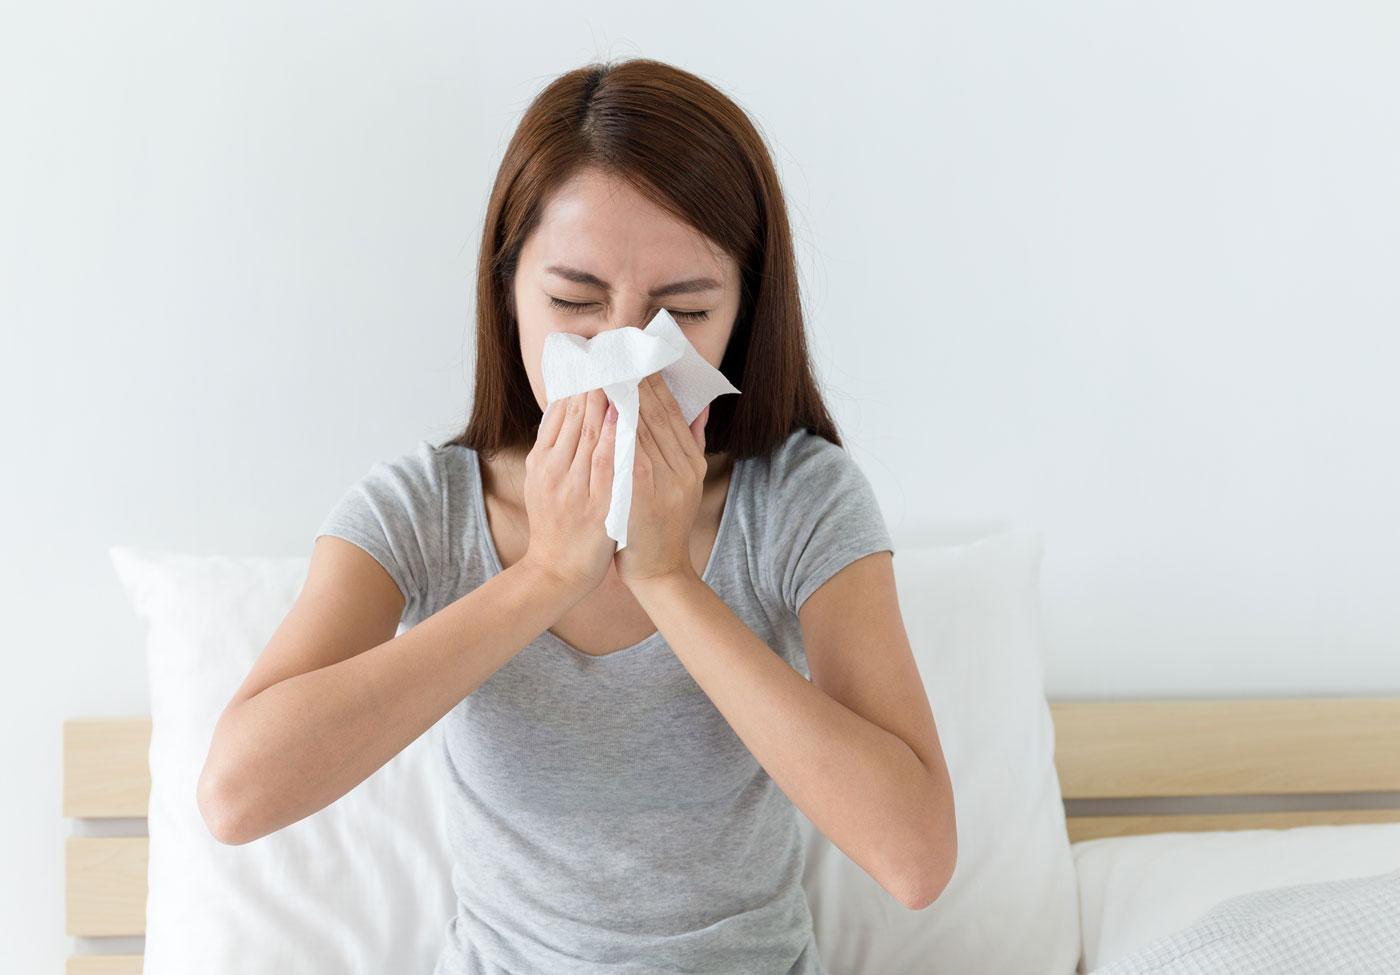 Vitamin C Benefits That Help Prevent Colds